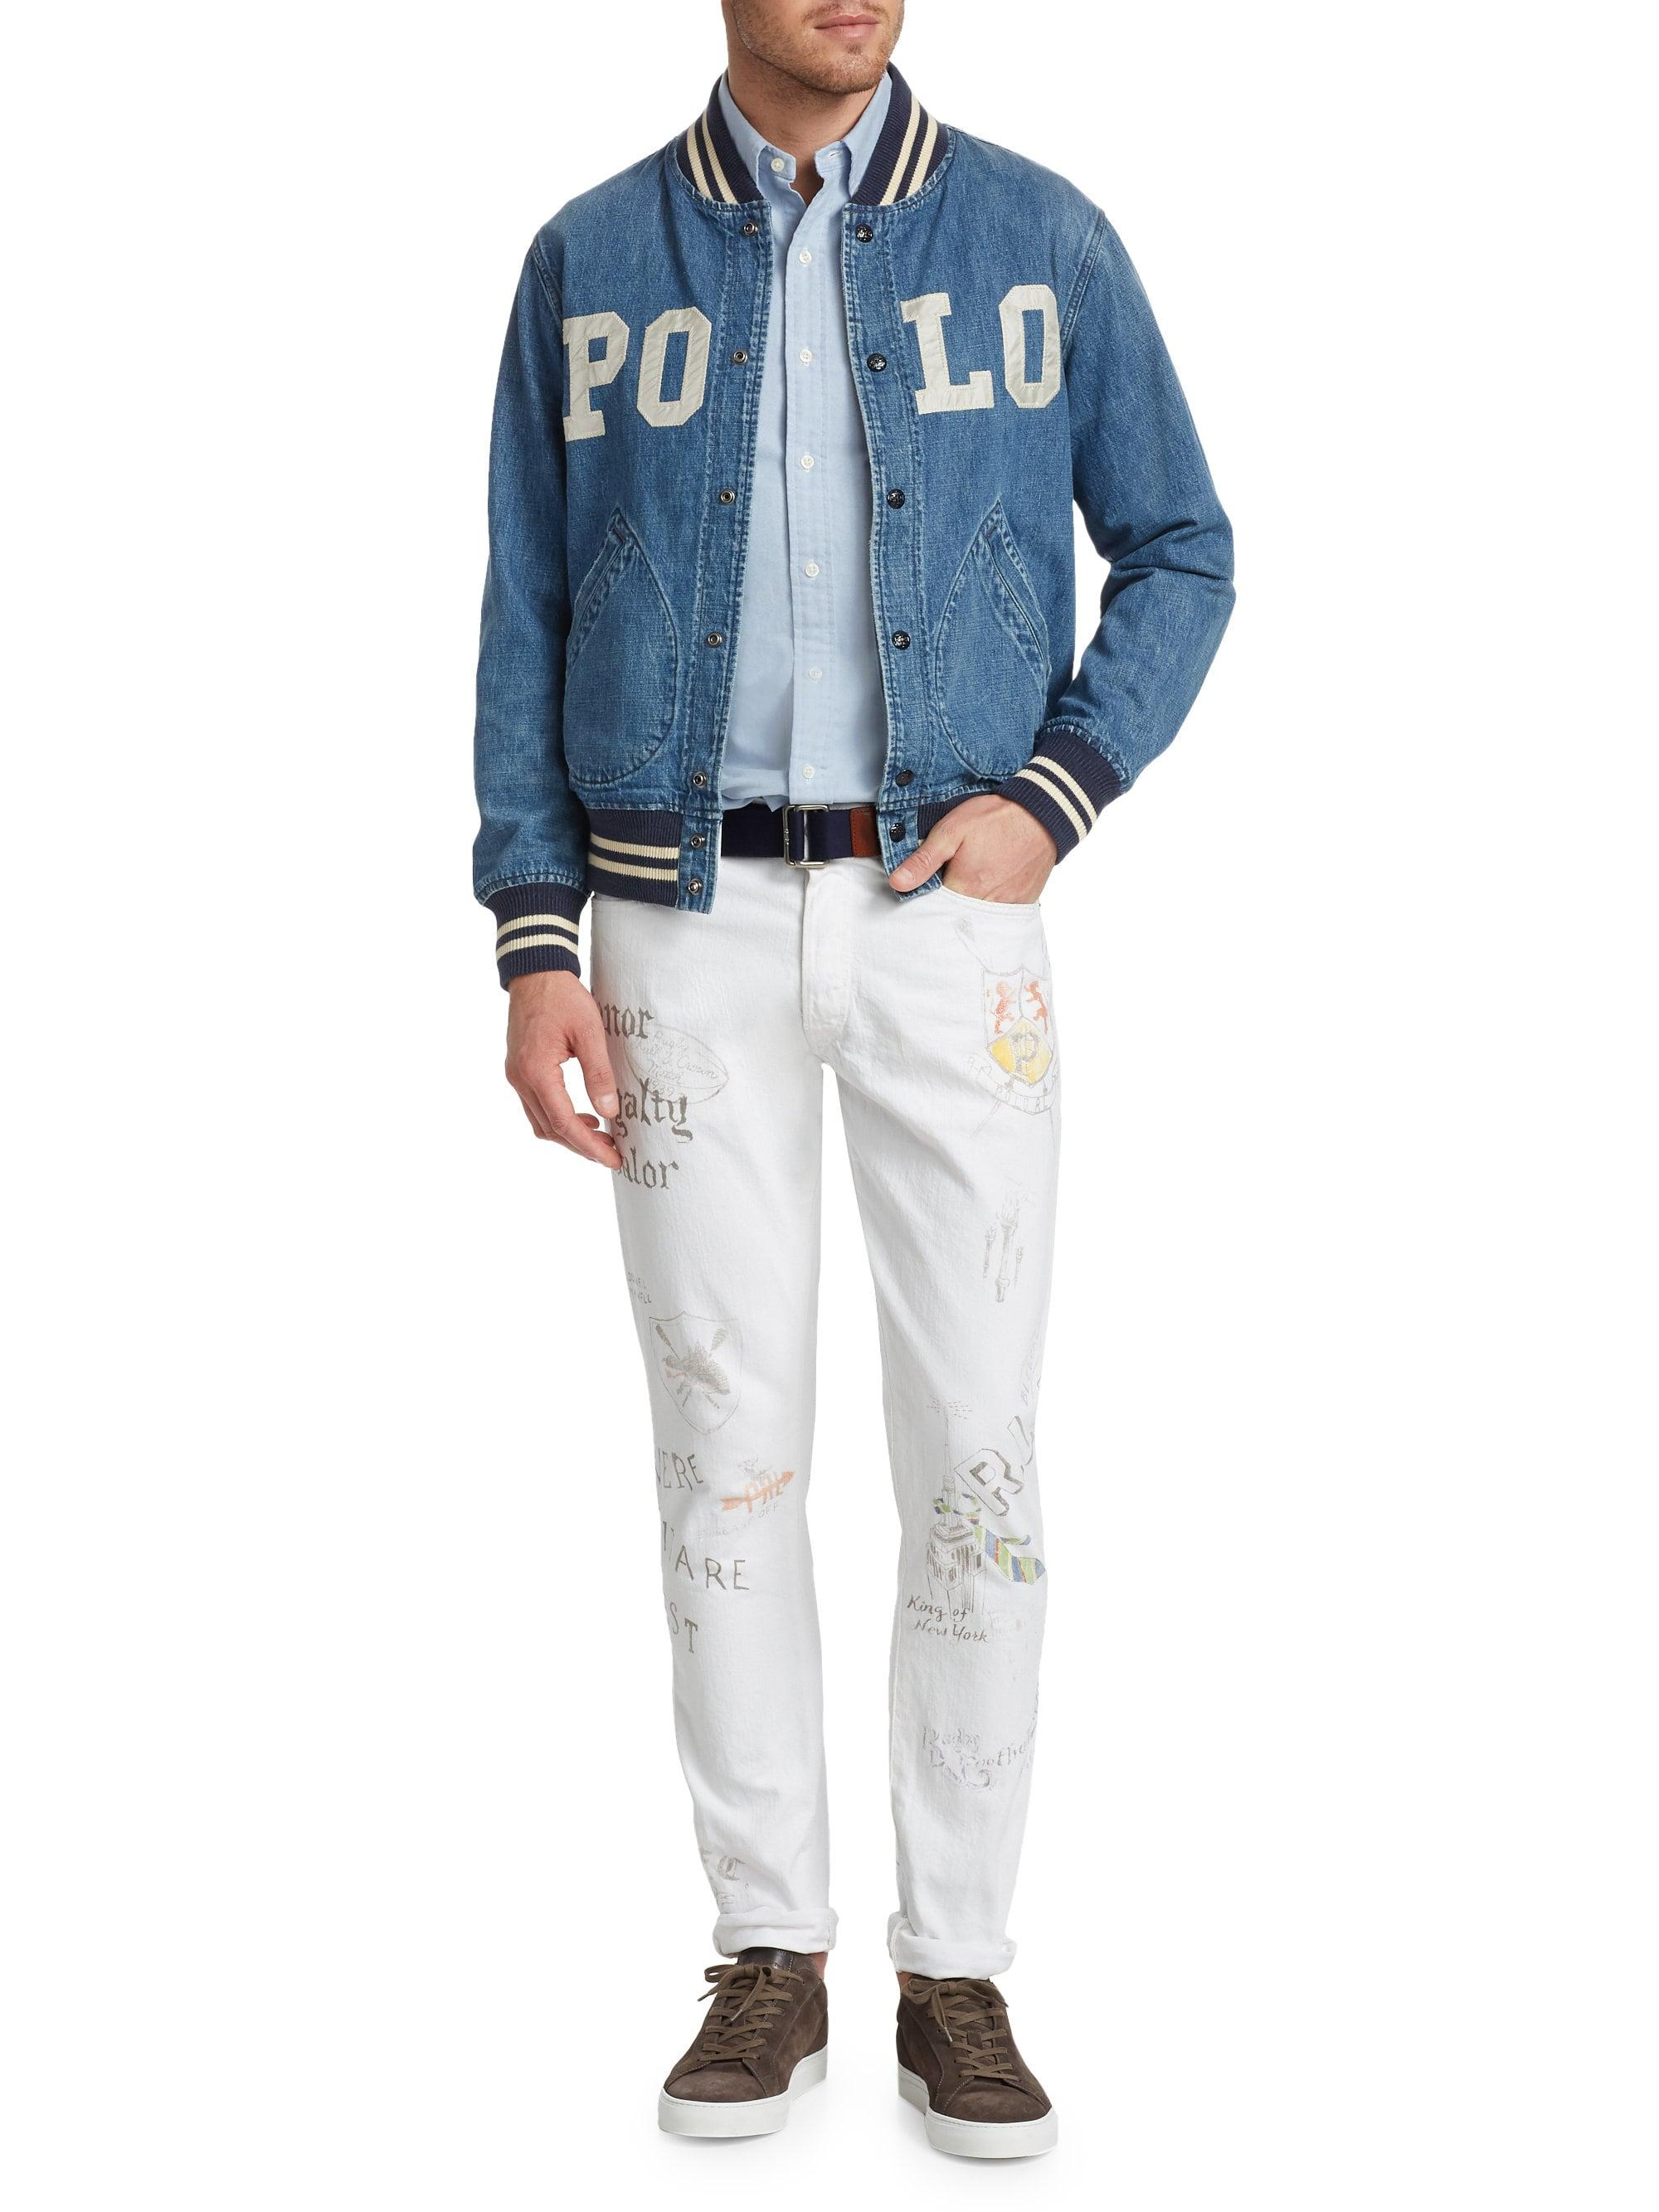 87b2a30b3cdb Polo Ralph Lauren - White Sullivan Slim Print Jeans for Men - Lyst. View  fullscreen